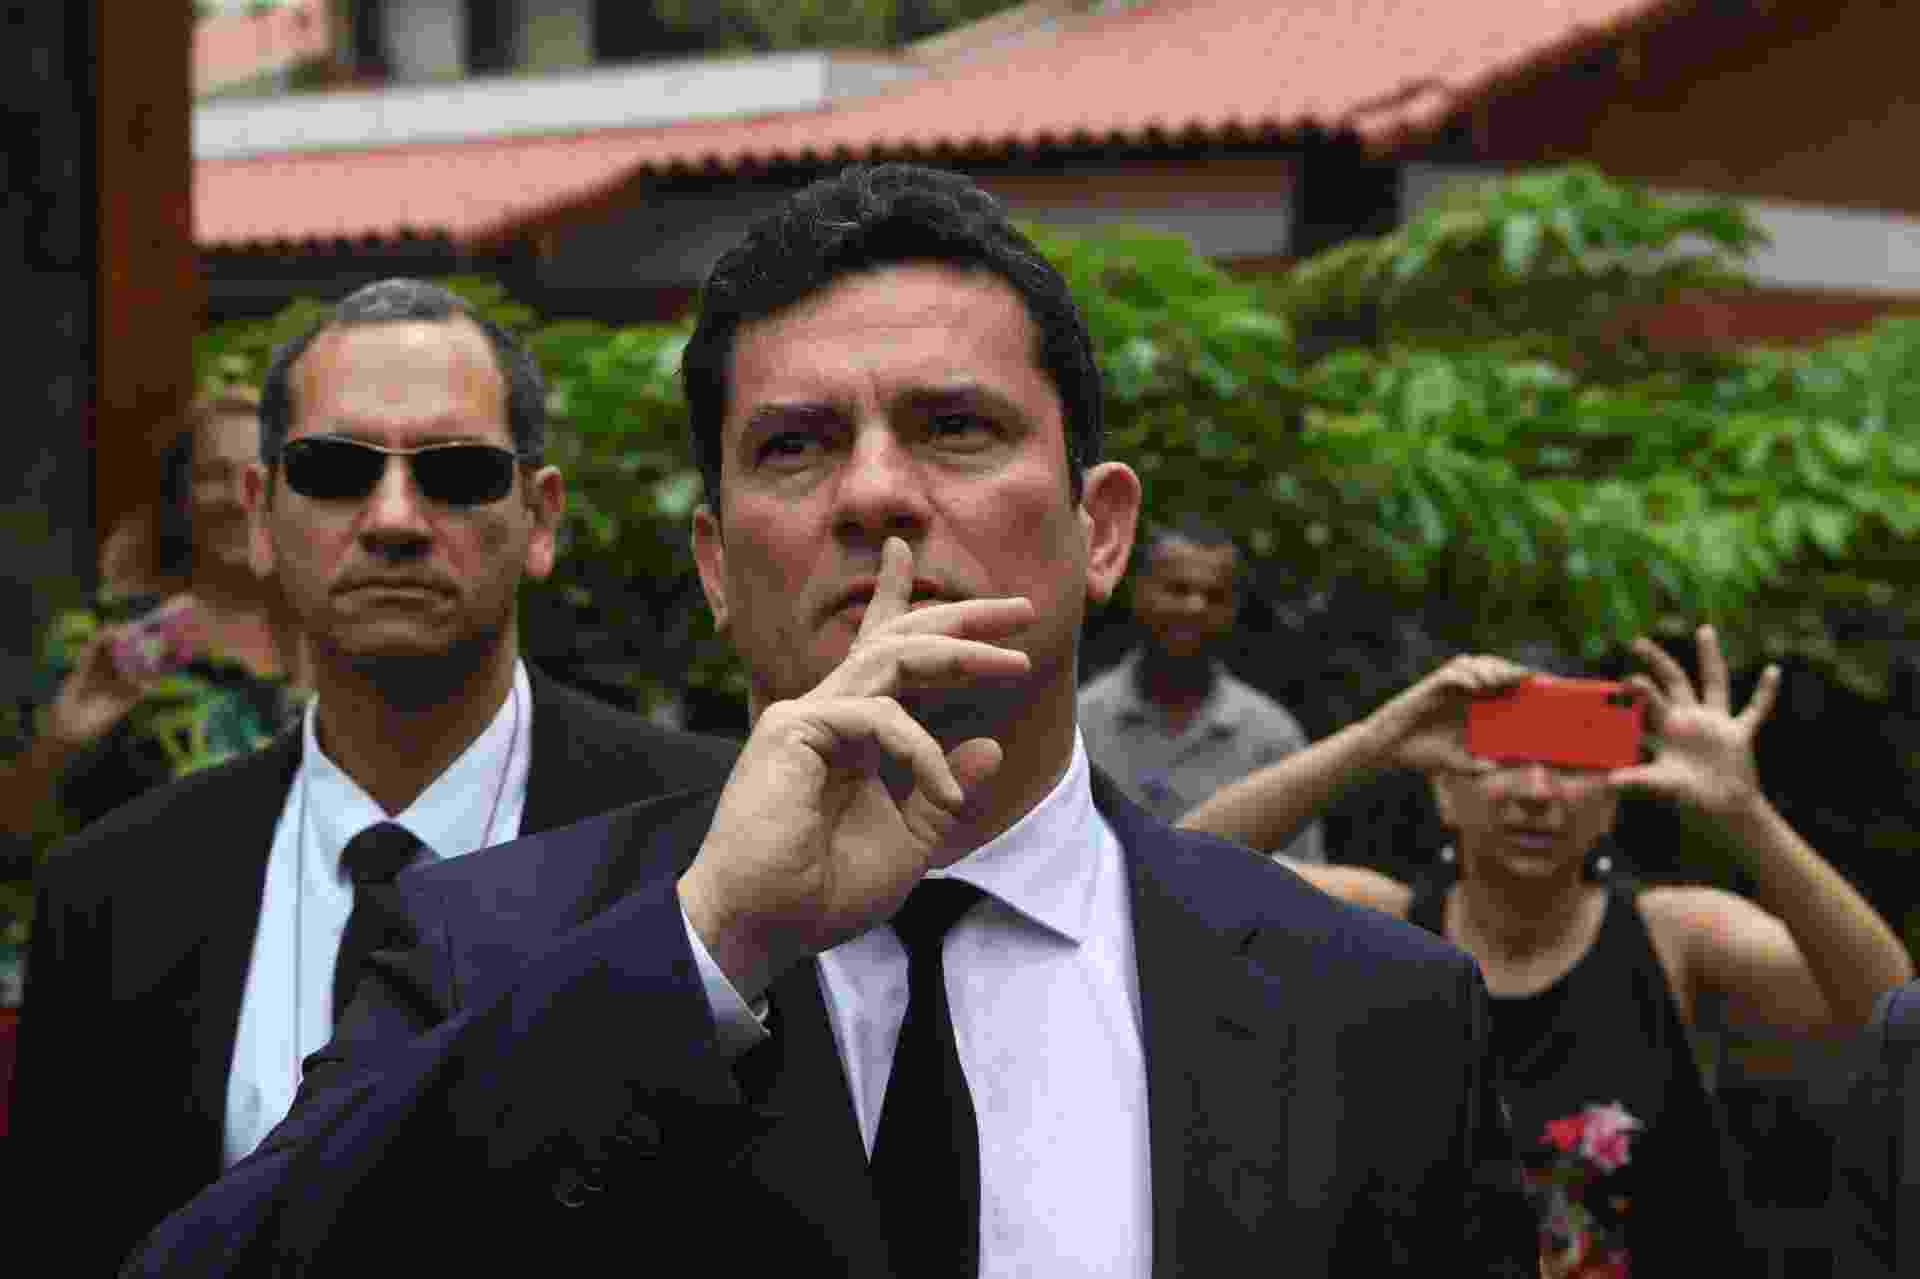 01.nov.2018 - Juiz Sergio Moro após conversar com presidente eleito Jair Bolsonaro (PSL) - Mauro Pimentel/AFP